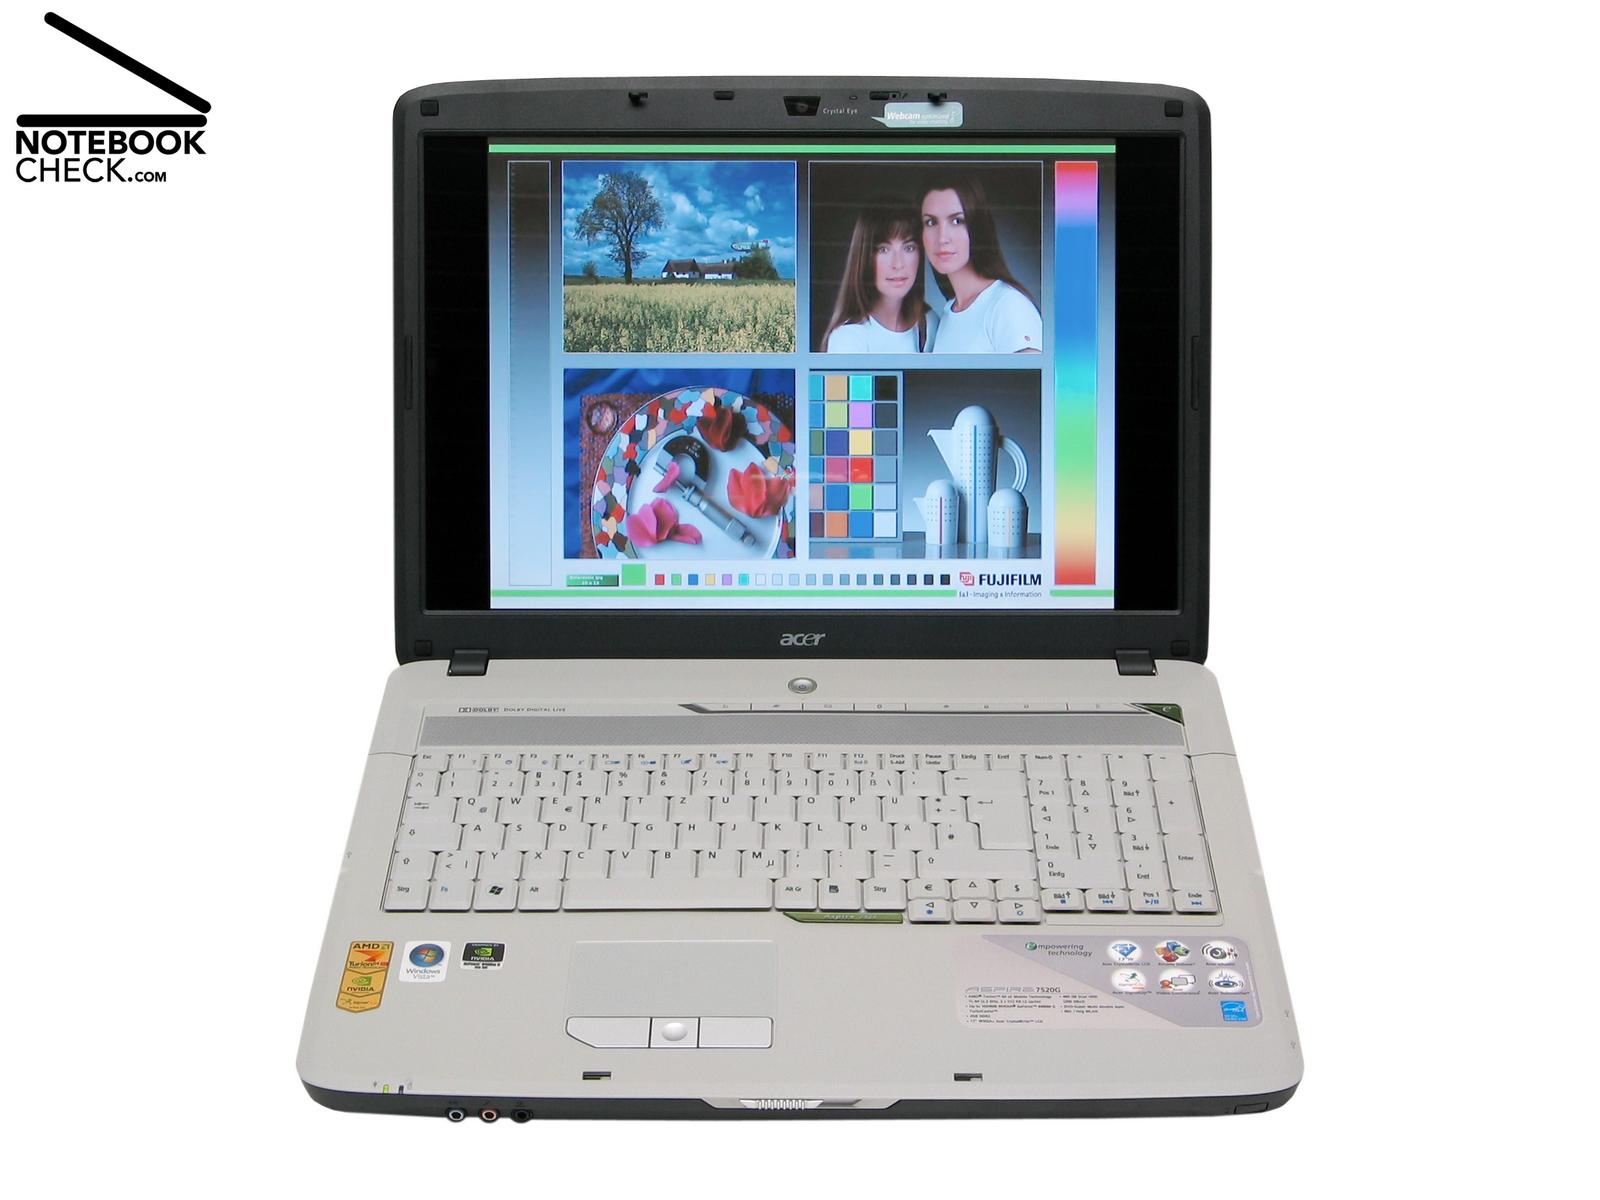 Critique Du Acer Aspire 7520g 602g40 Notebookcheck Fr